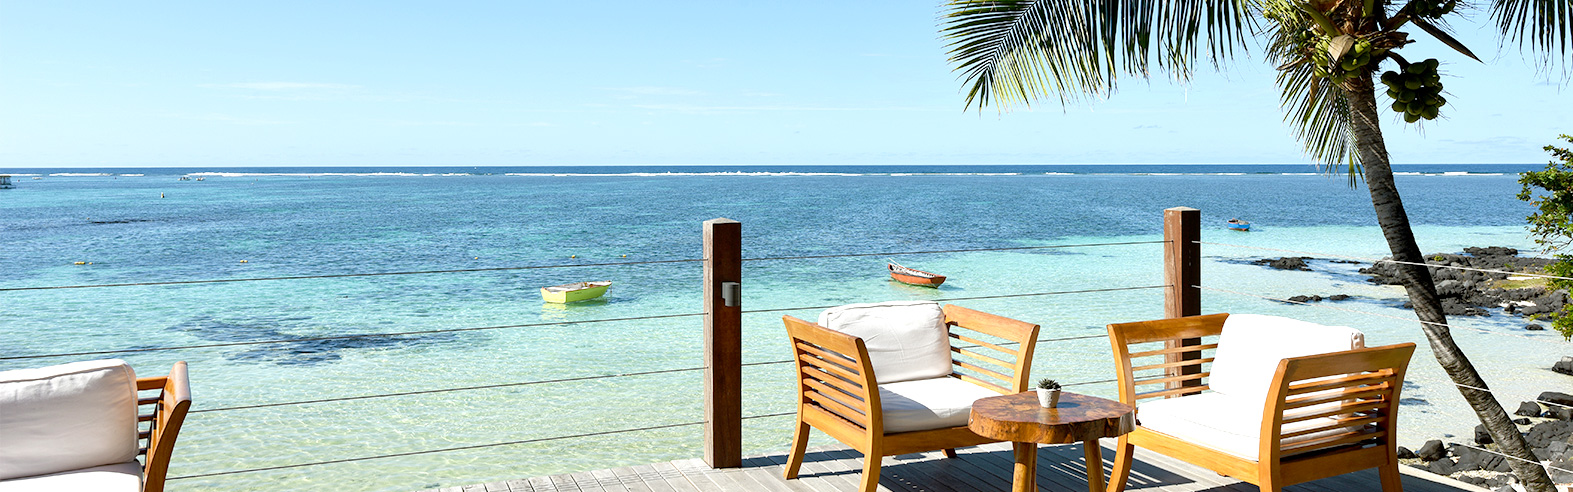 Solana Restaurants and Bars